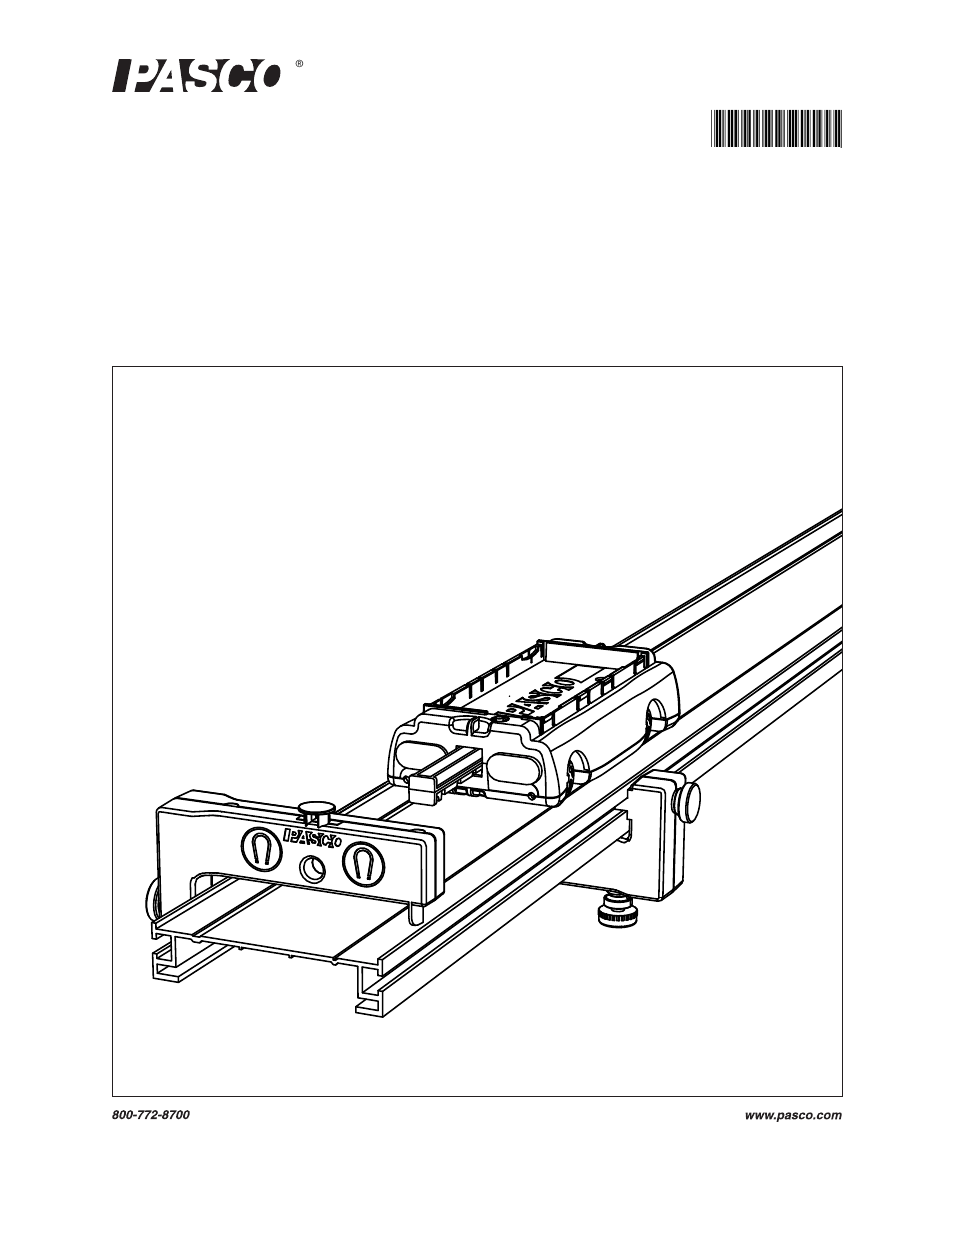 PASCO ME-6956 2.2 m PAScar Dynamics System User Manual